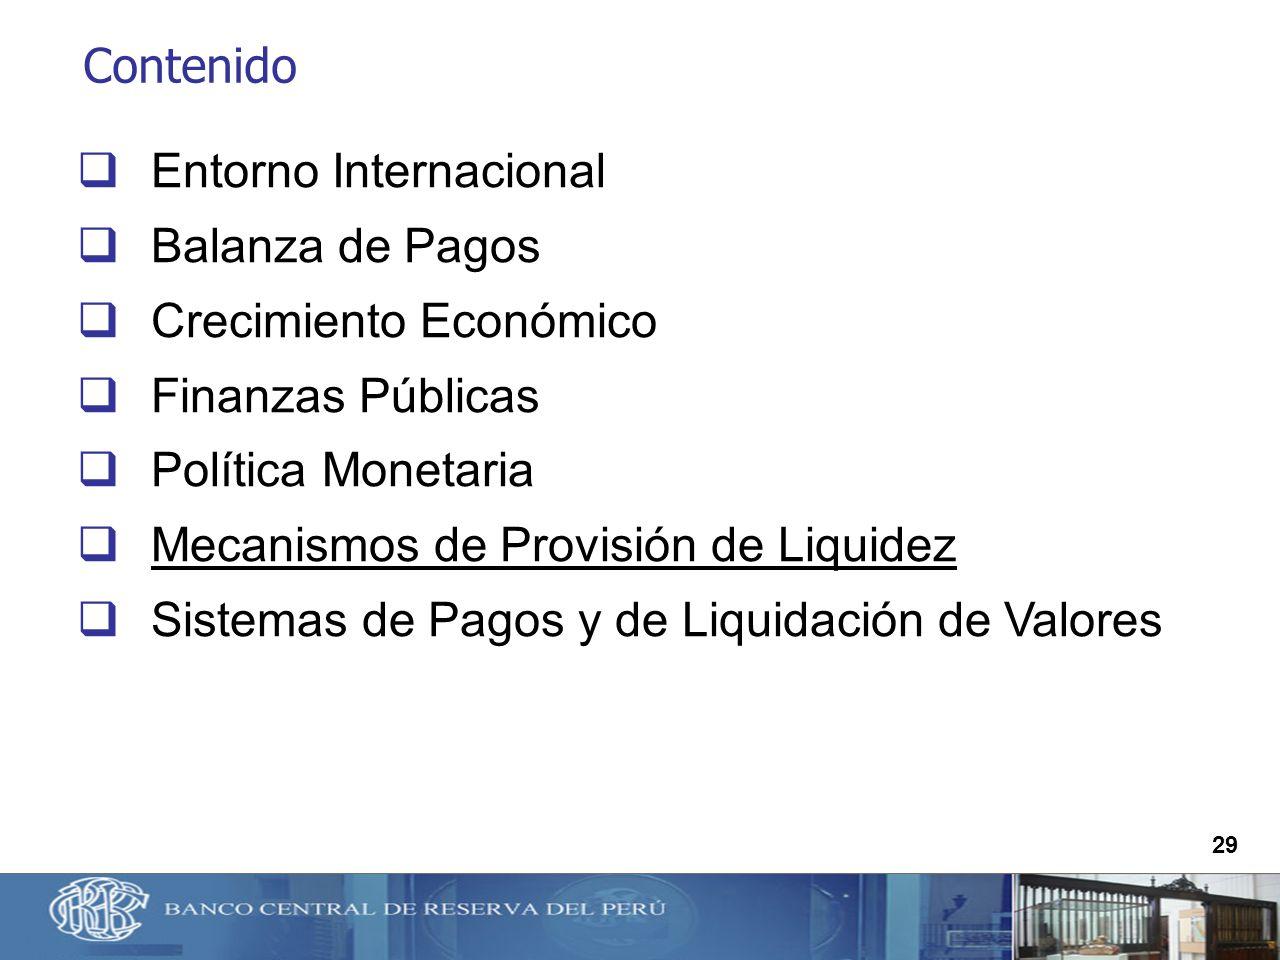 29 Contenido Entorno Internacional Balanza de Pagos Crecimiento Económico Finanzas Públicas Política Monetaria Mecanismos de Provisión de Liquidez Sis